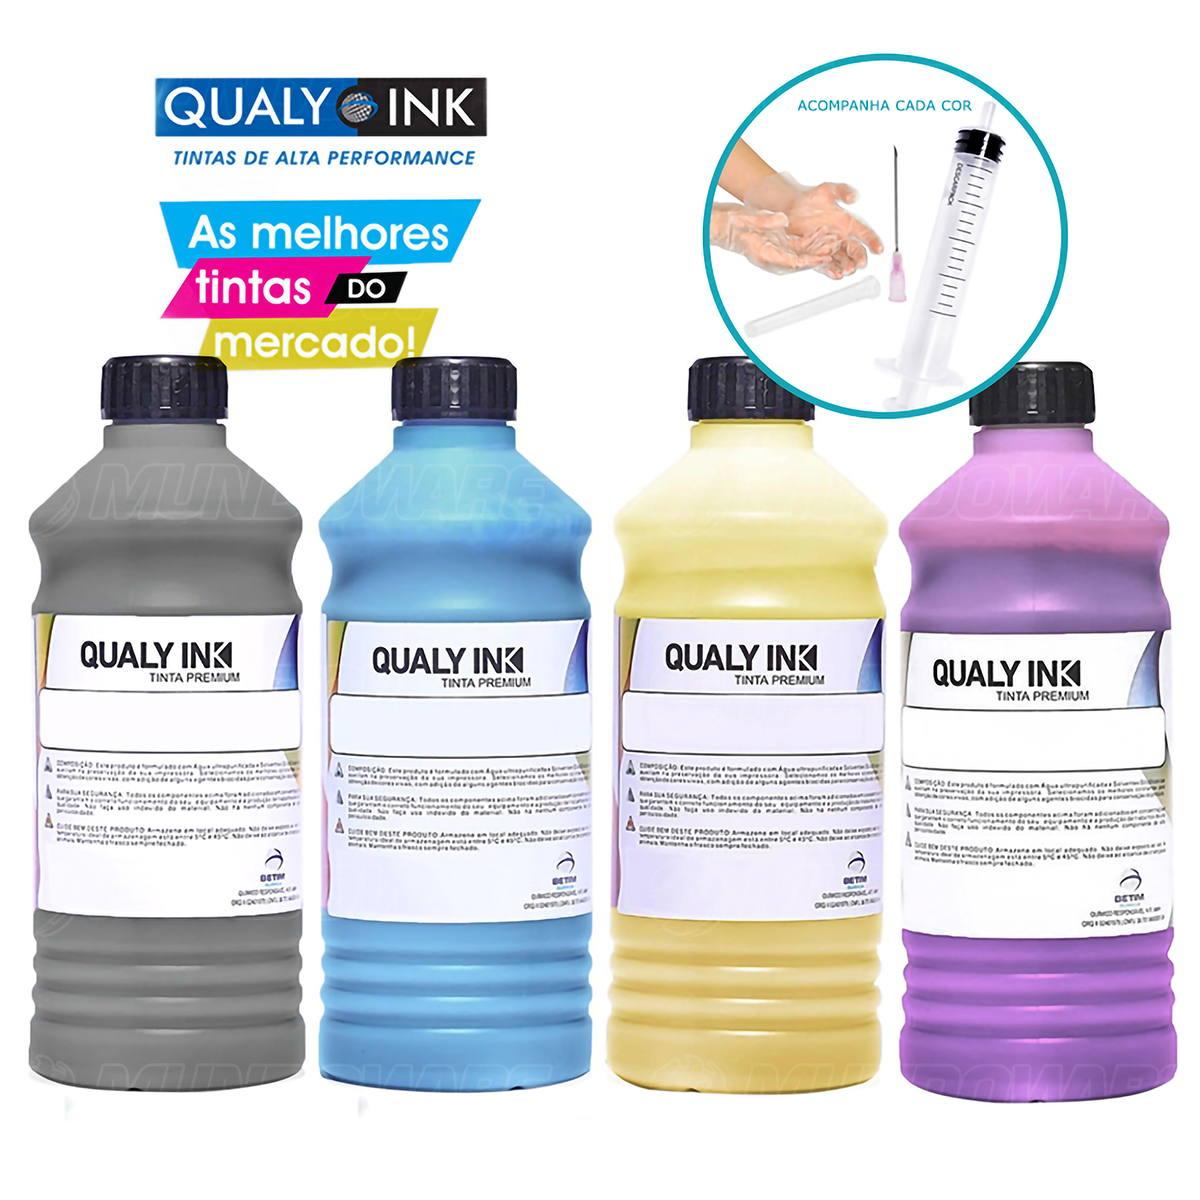 Kit 4 Cores Tinta Corante Qualy-Ink para Brother MFC-J6520dw J6720dw J6920dw 5490cn 6490cw 6890cdw J140w CMYK 4 de 1L